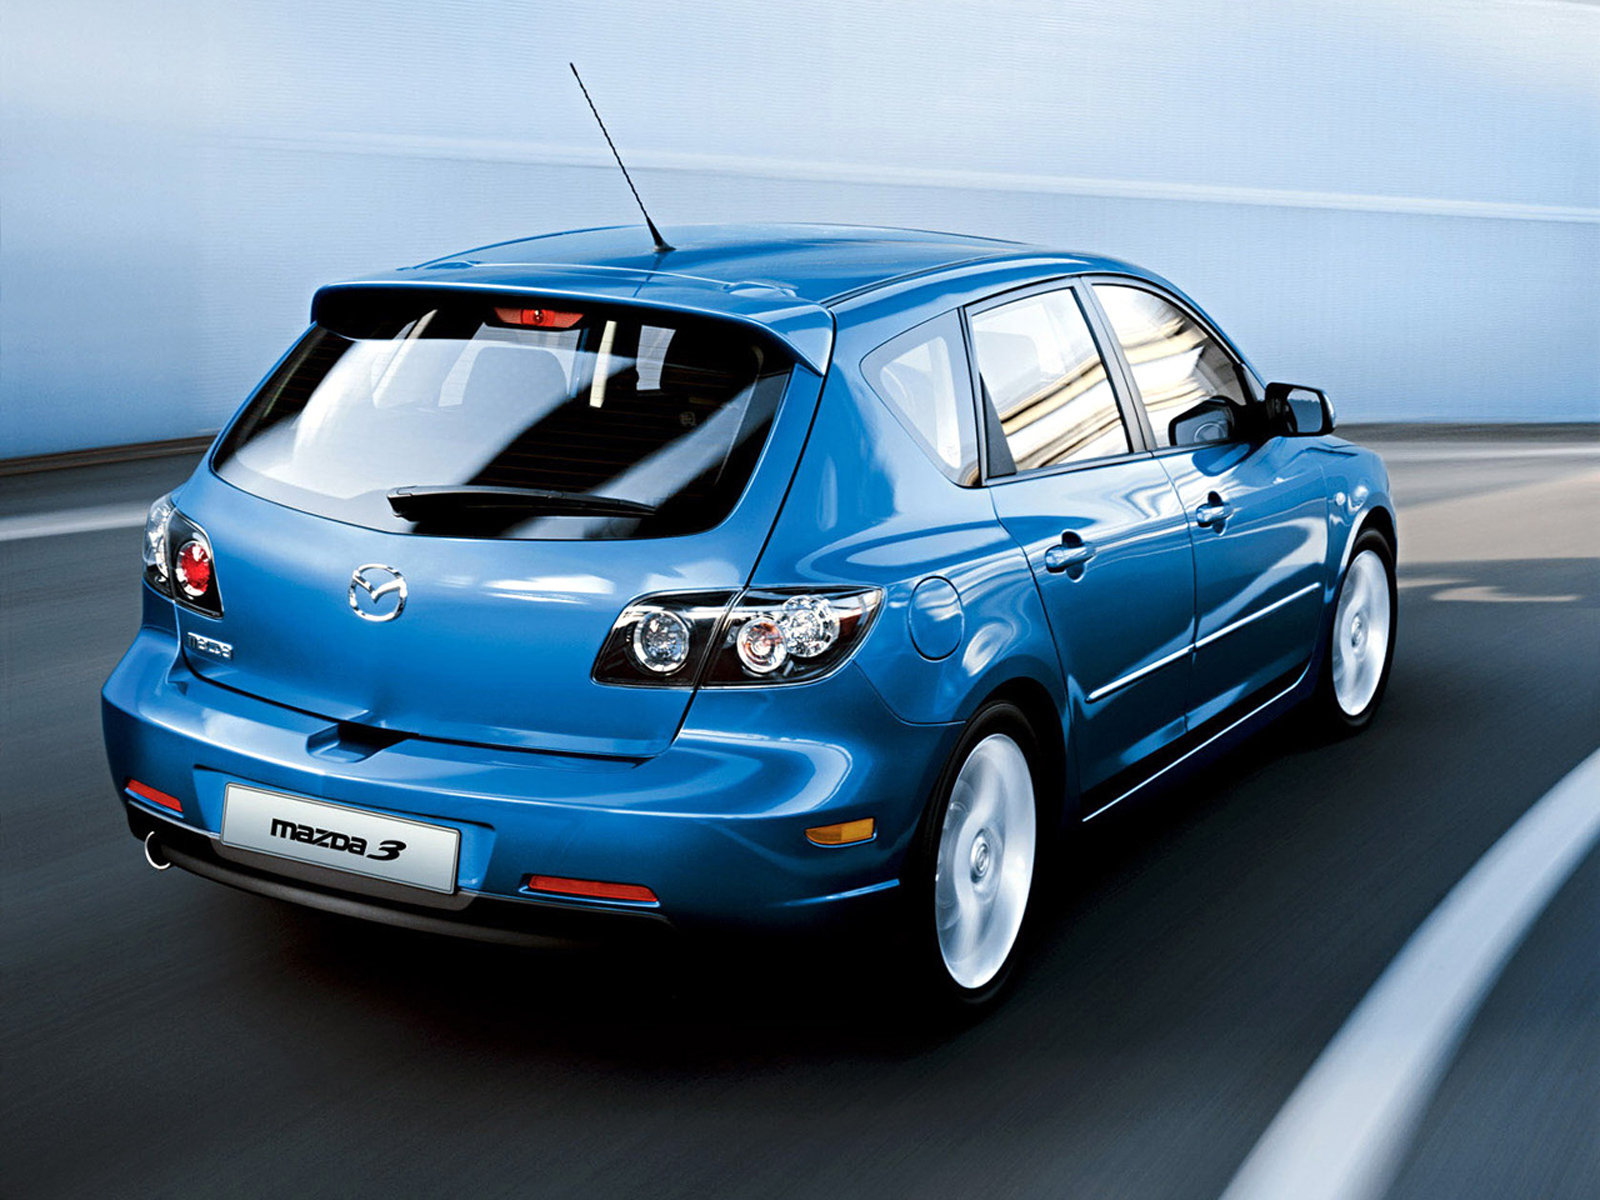 Mazda (Мазда) 3 Sport 2003-2006 г.